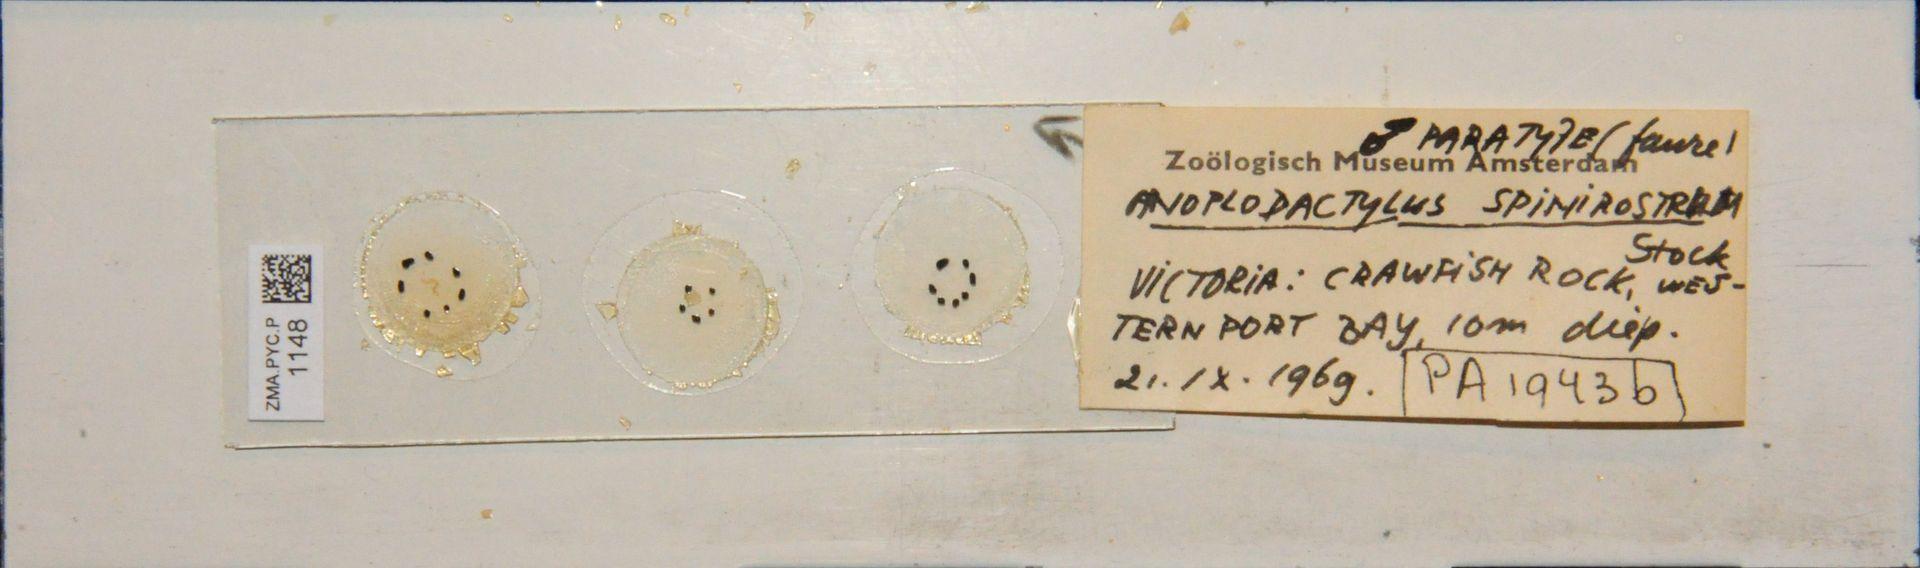 ZMA.PYC.P.1148 | Anoplodactylus spinirostrum Stock